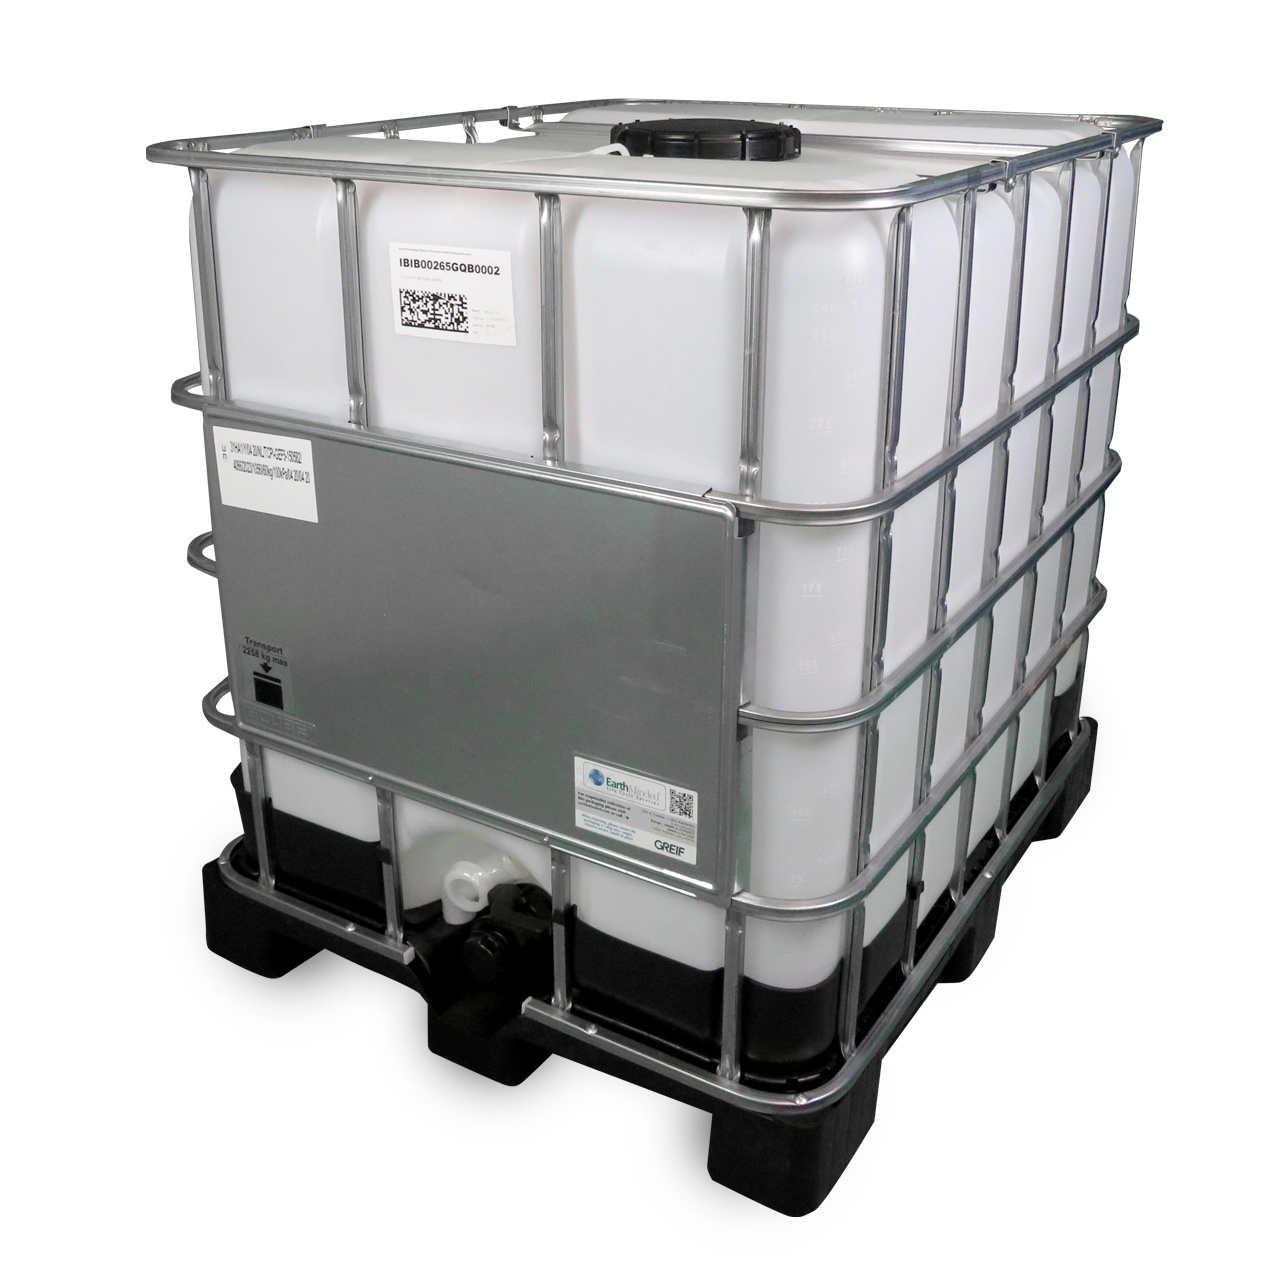 1000 L IBC Container, Kunststoff-Palette, 225/50, UN Zulassung